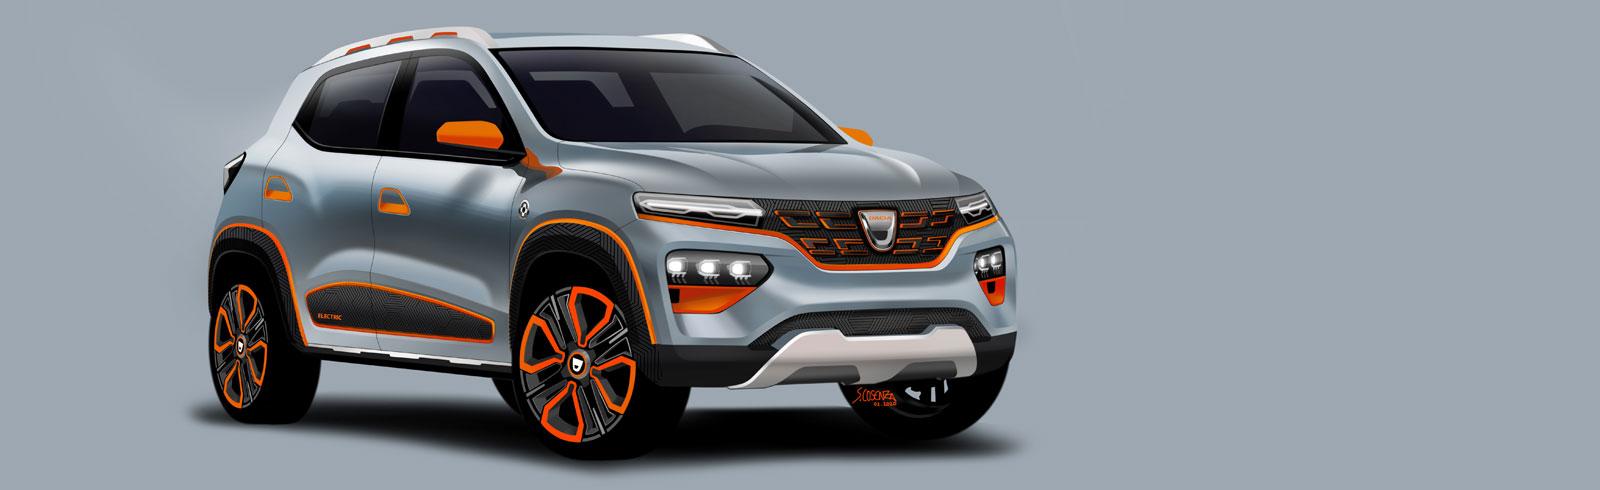 Dacia Spring previews Dacia's first all-electric model